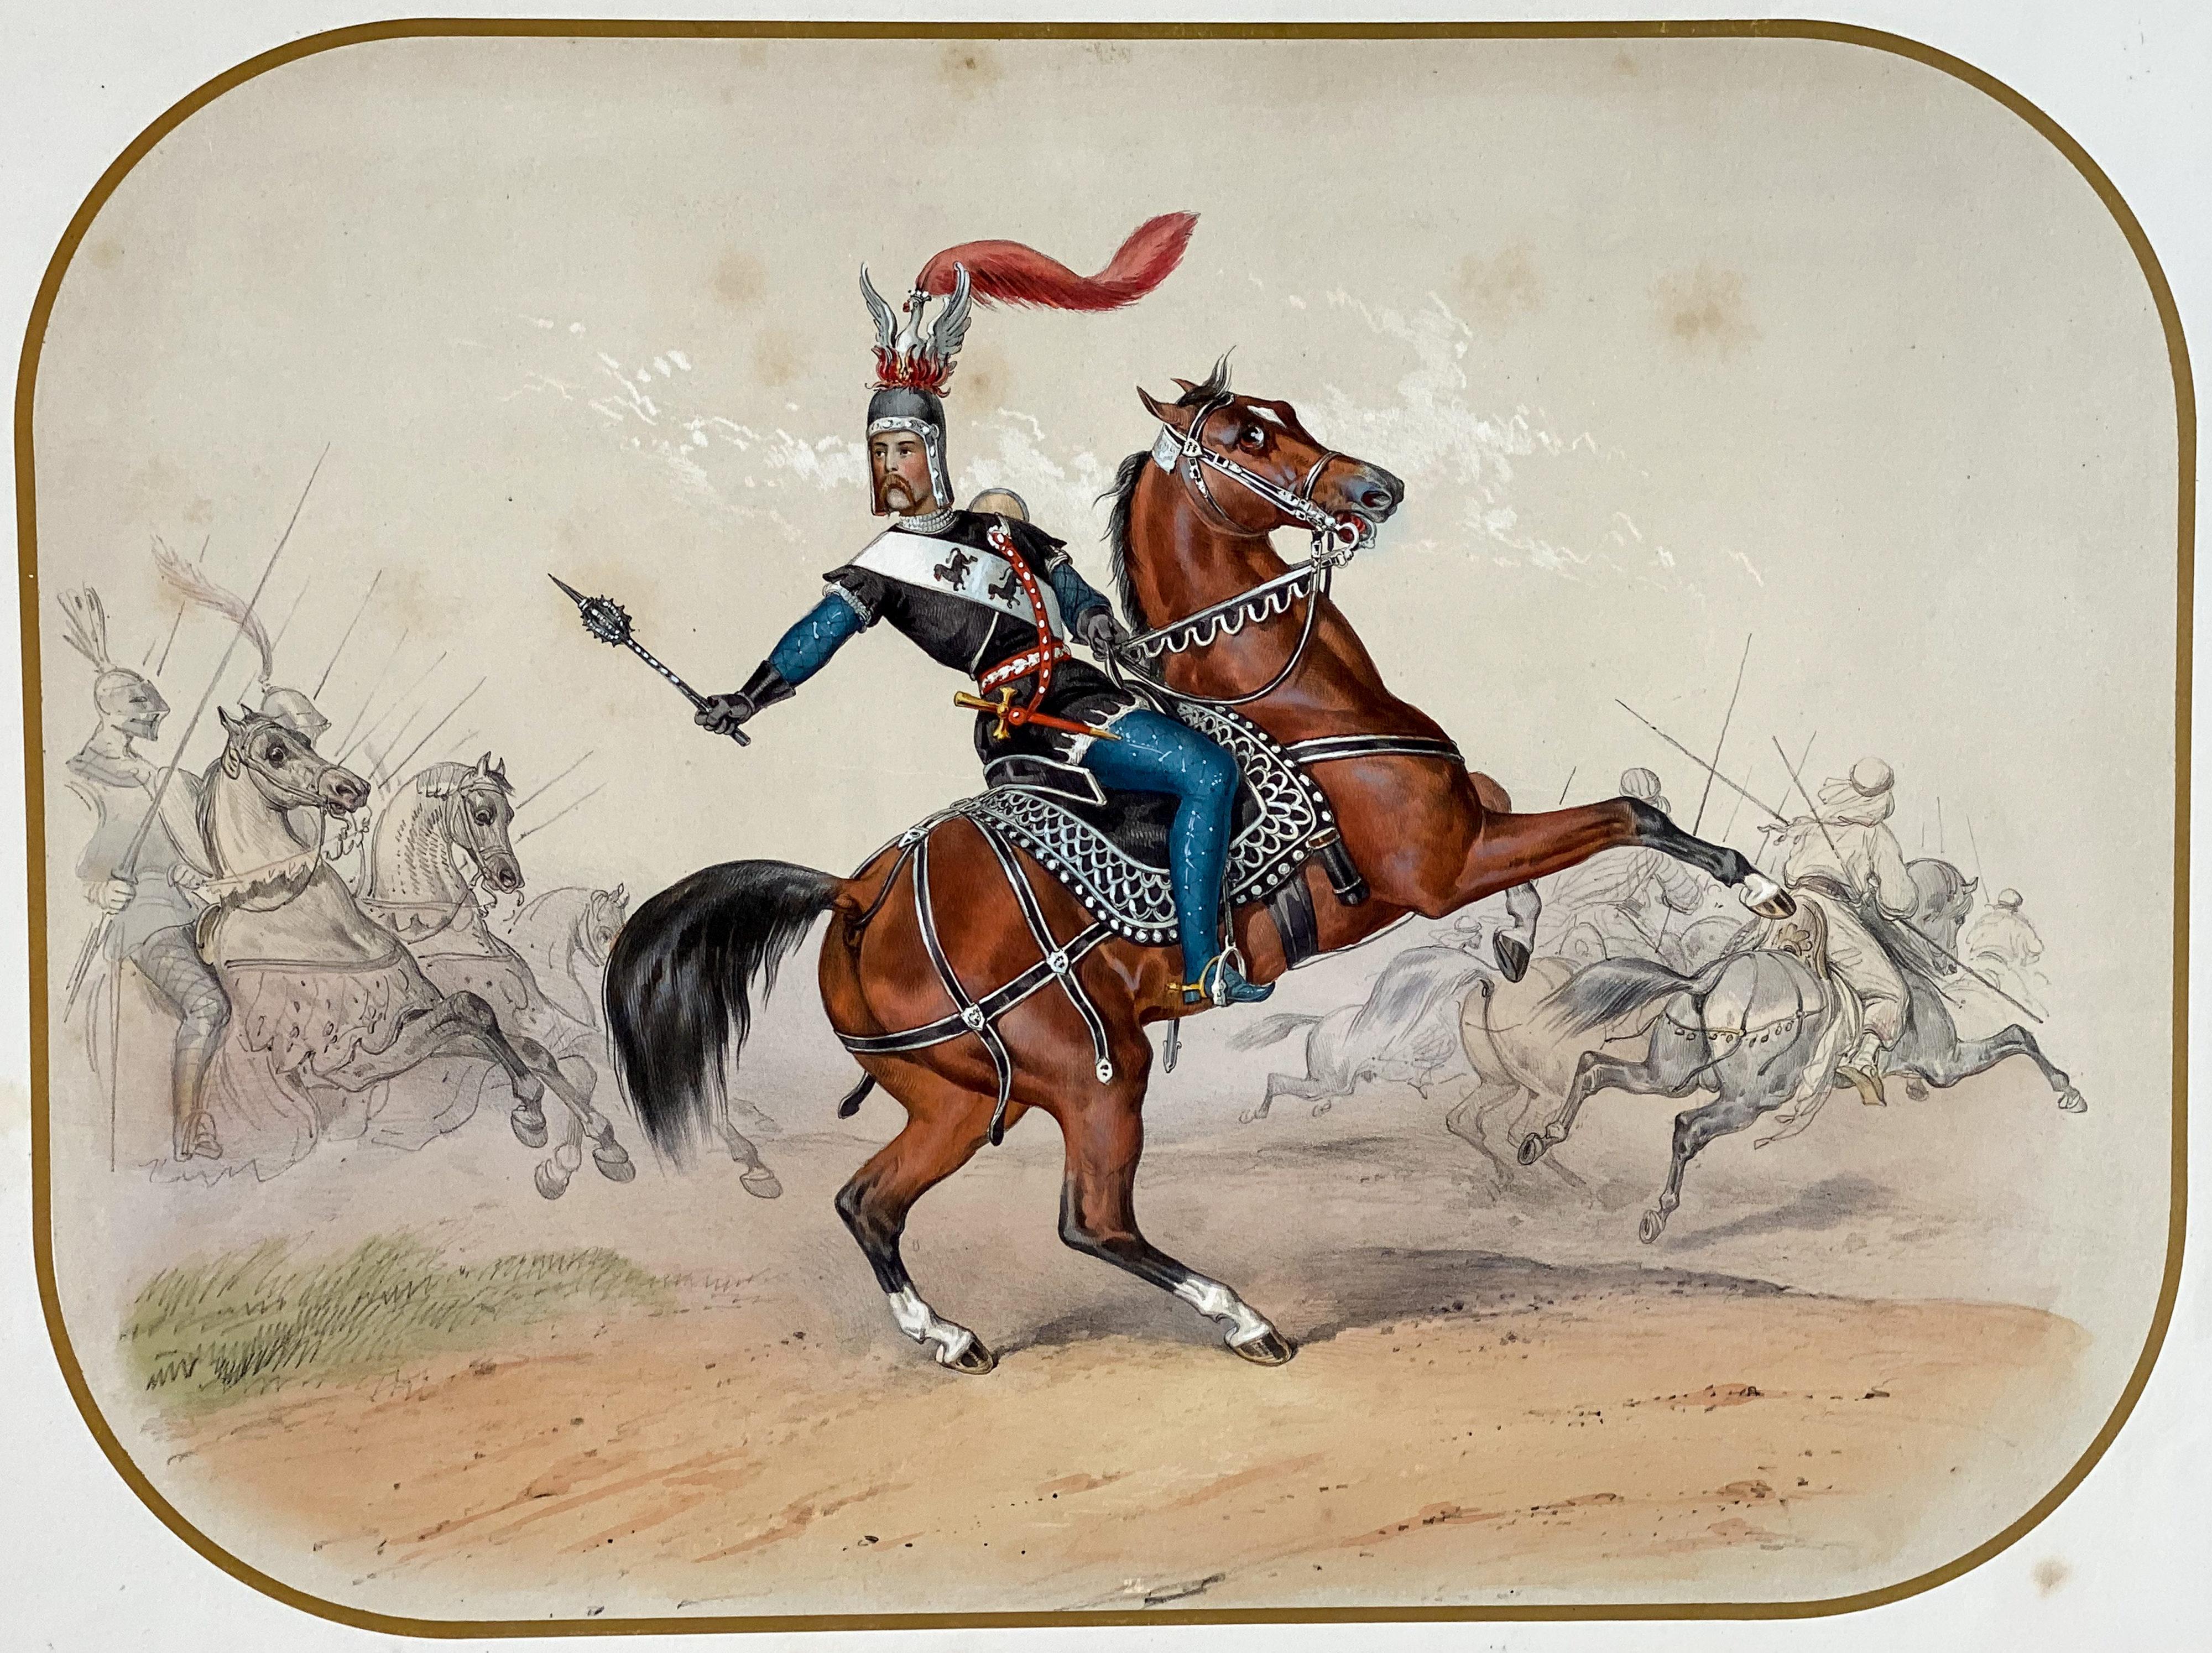 Reiterfest/Caroussel: Einzug weiterer Ritter – Prinz Felix Hohenlohe-Öhringen